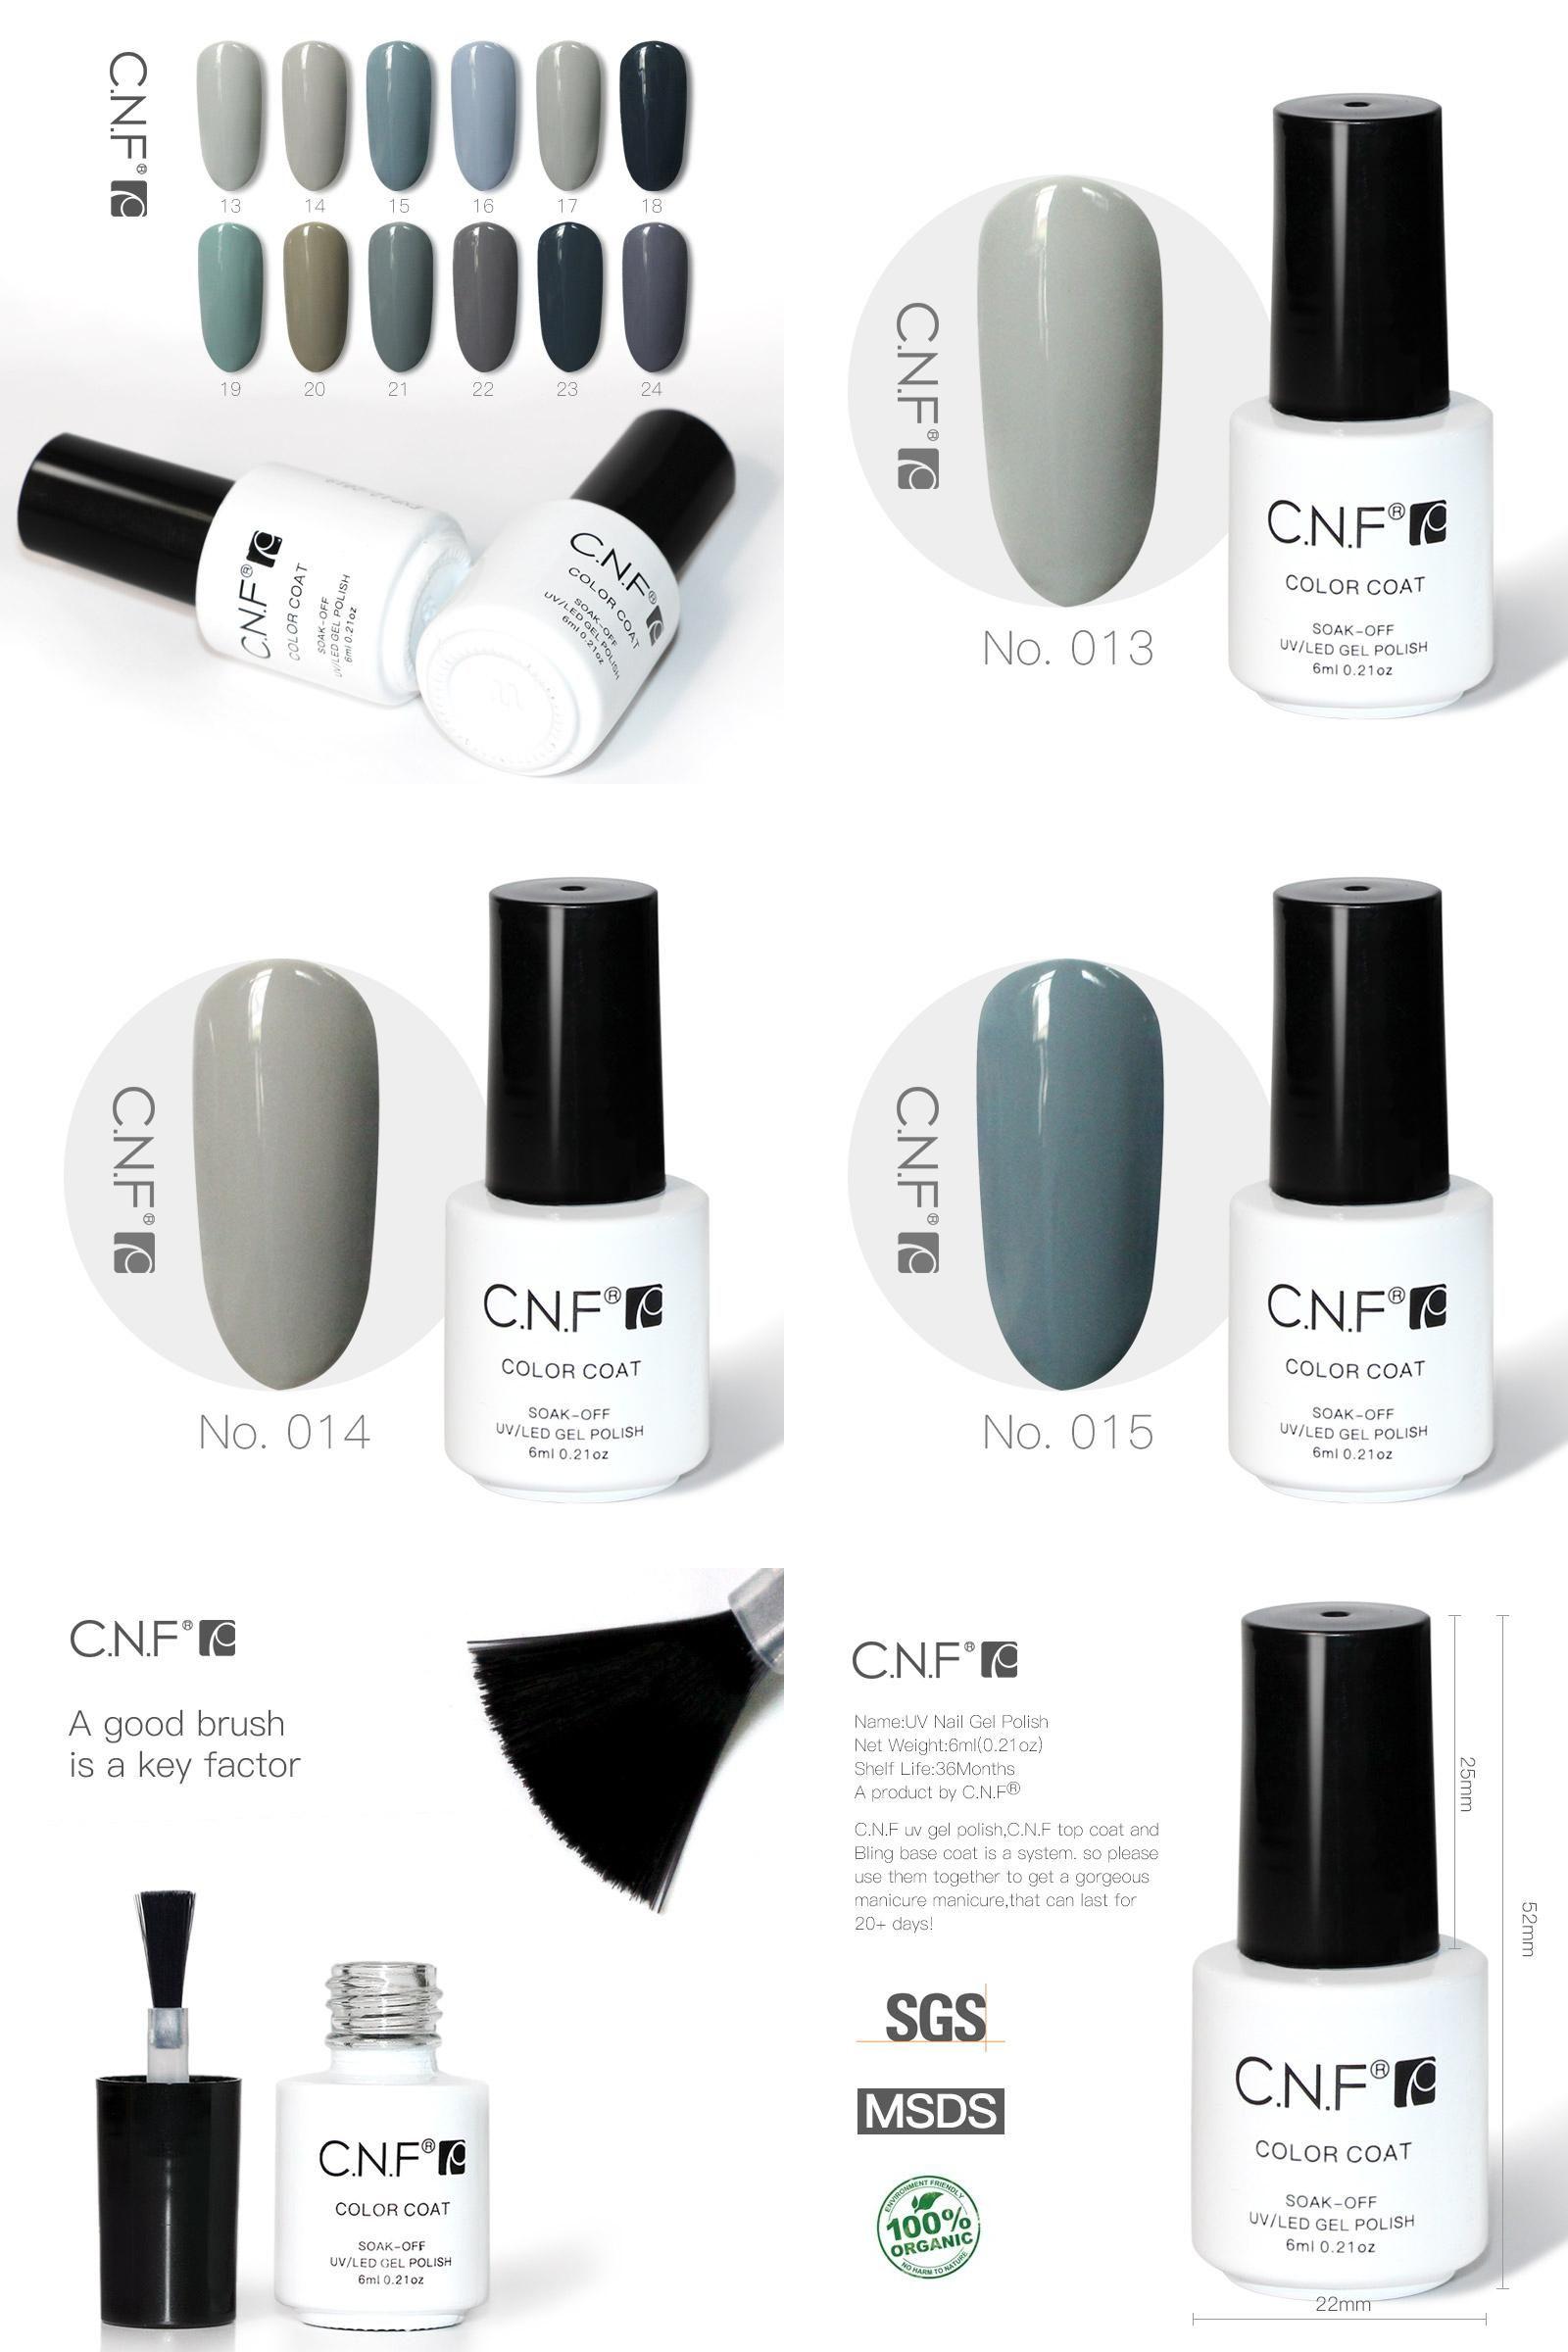 Visit to Buy] C.N.F Gel Nail Polish 6ml Professional Nails Uv Gel ...